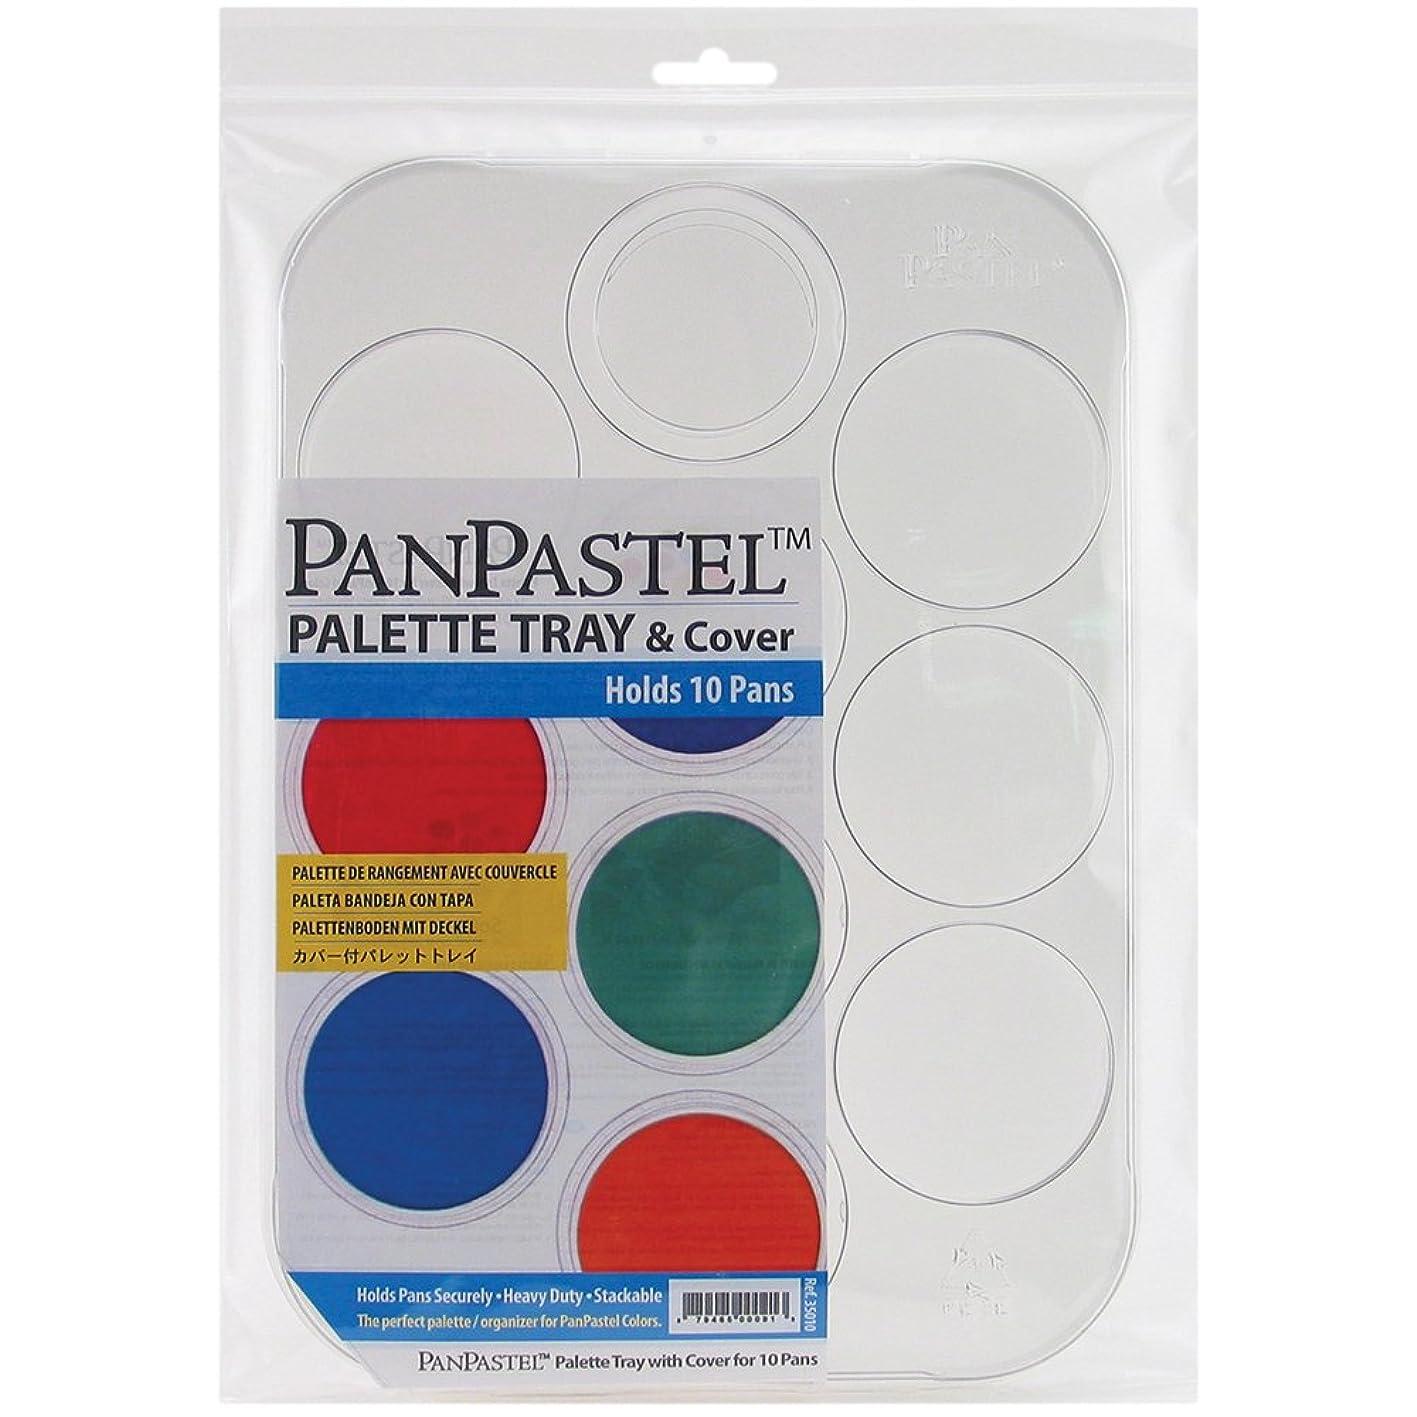 PanPastel 10 Cavity Palette Tray rdpbzmbqxxj028